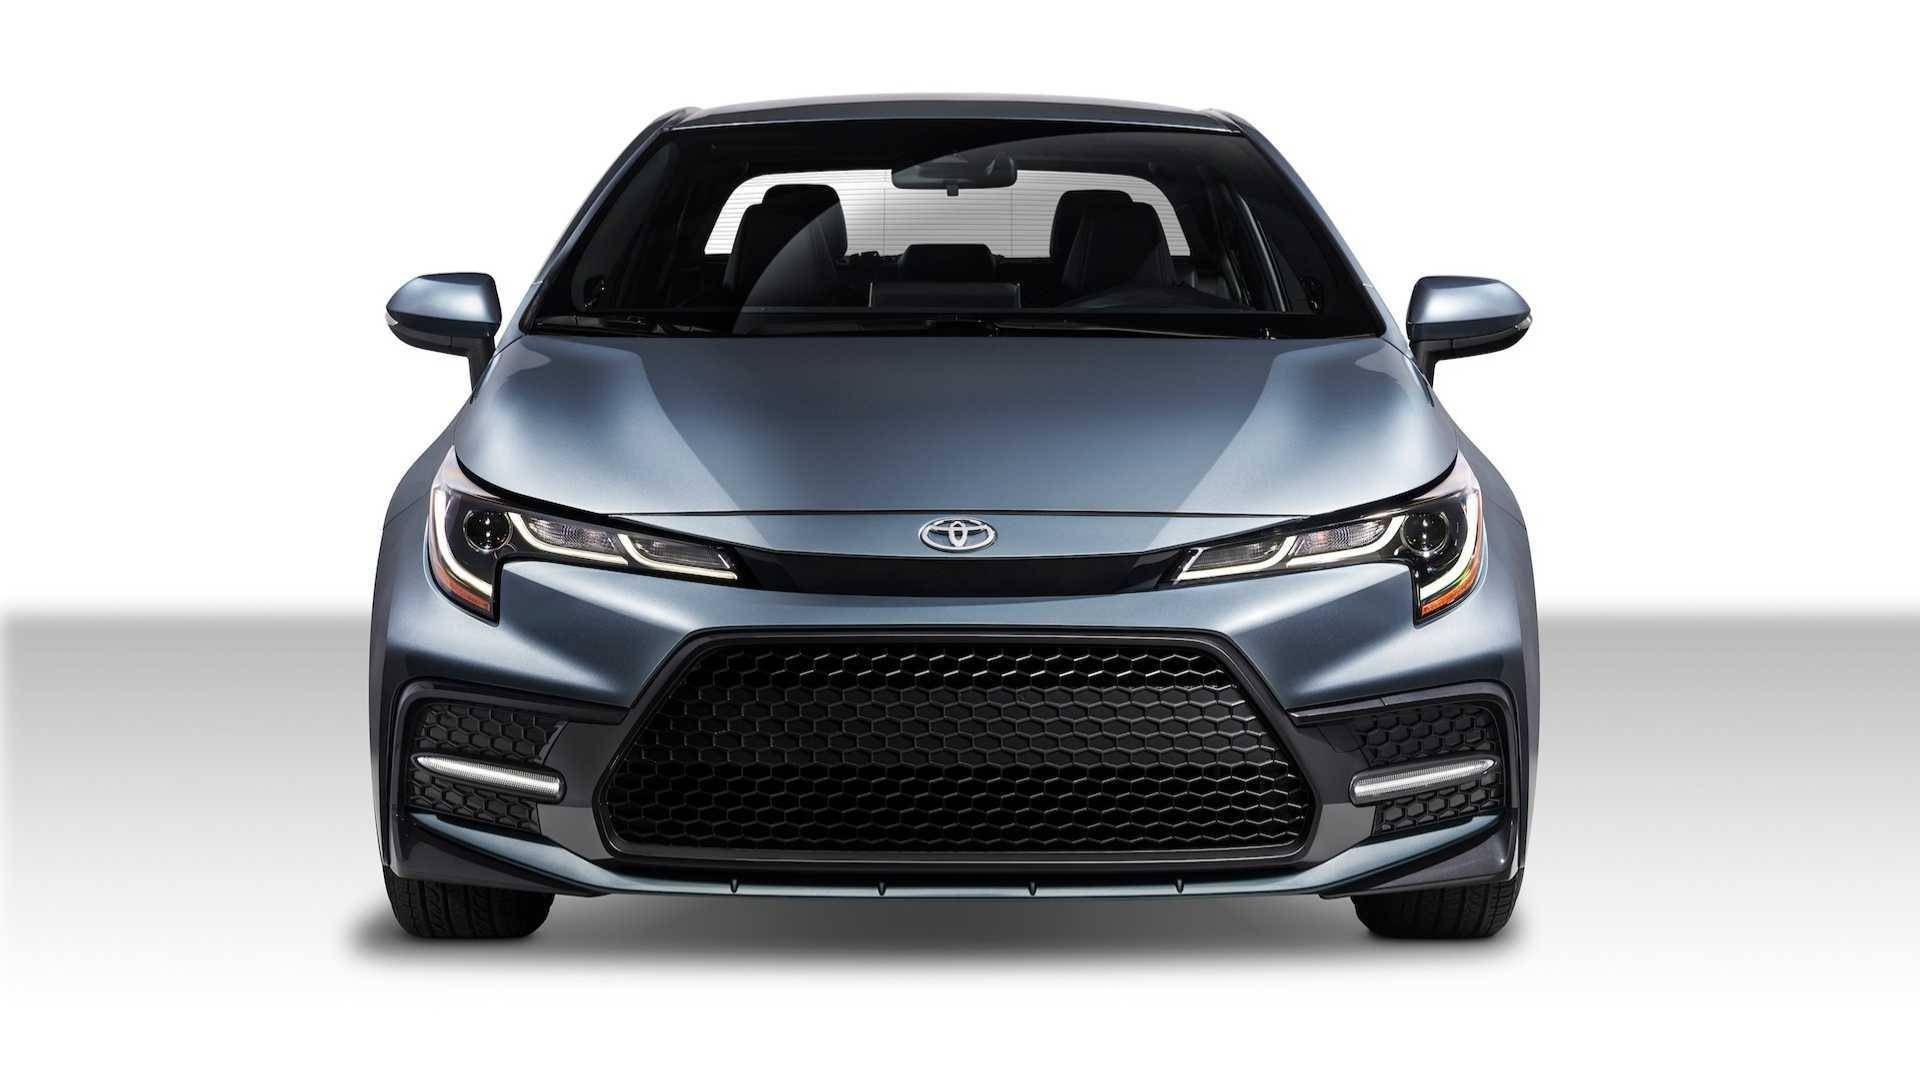 Toyota corolla рестайлинг 2016, 2017, 2018, 2019, седан, 11 поколение, e180 технические характеристики и комплектации